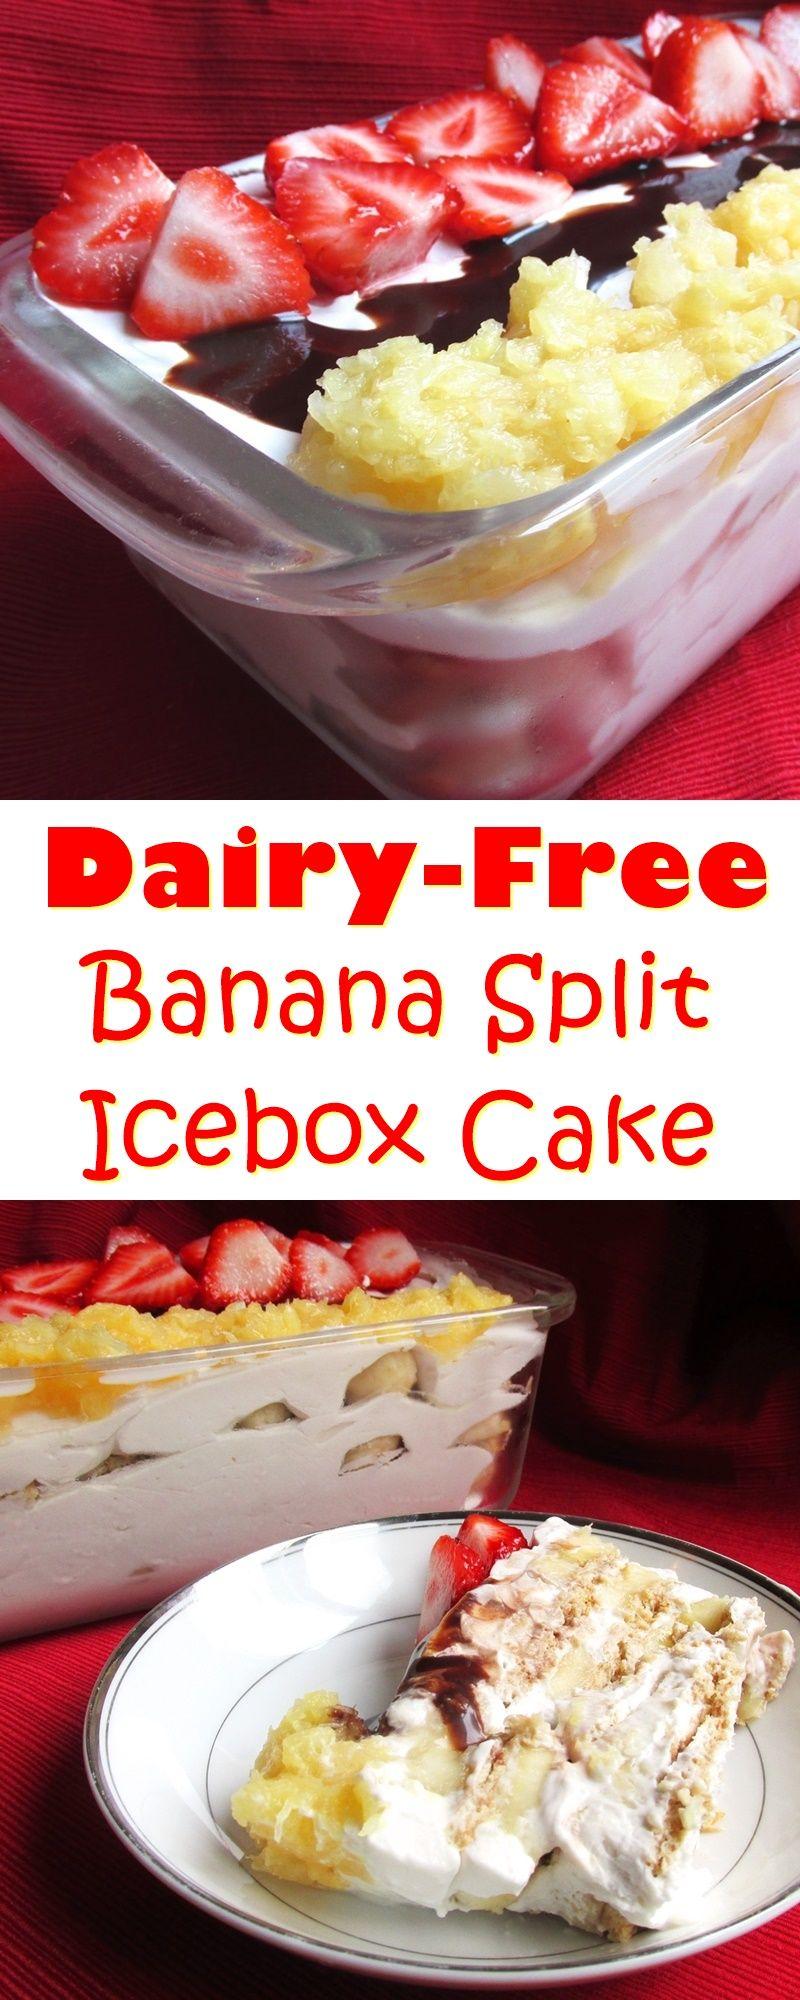 Banana Split Icebox Cake - an easy, no baked, dairy-free dessert recipe with gluten-free & vegan options